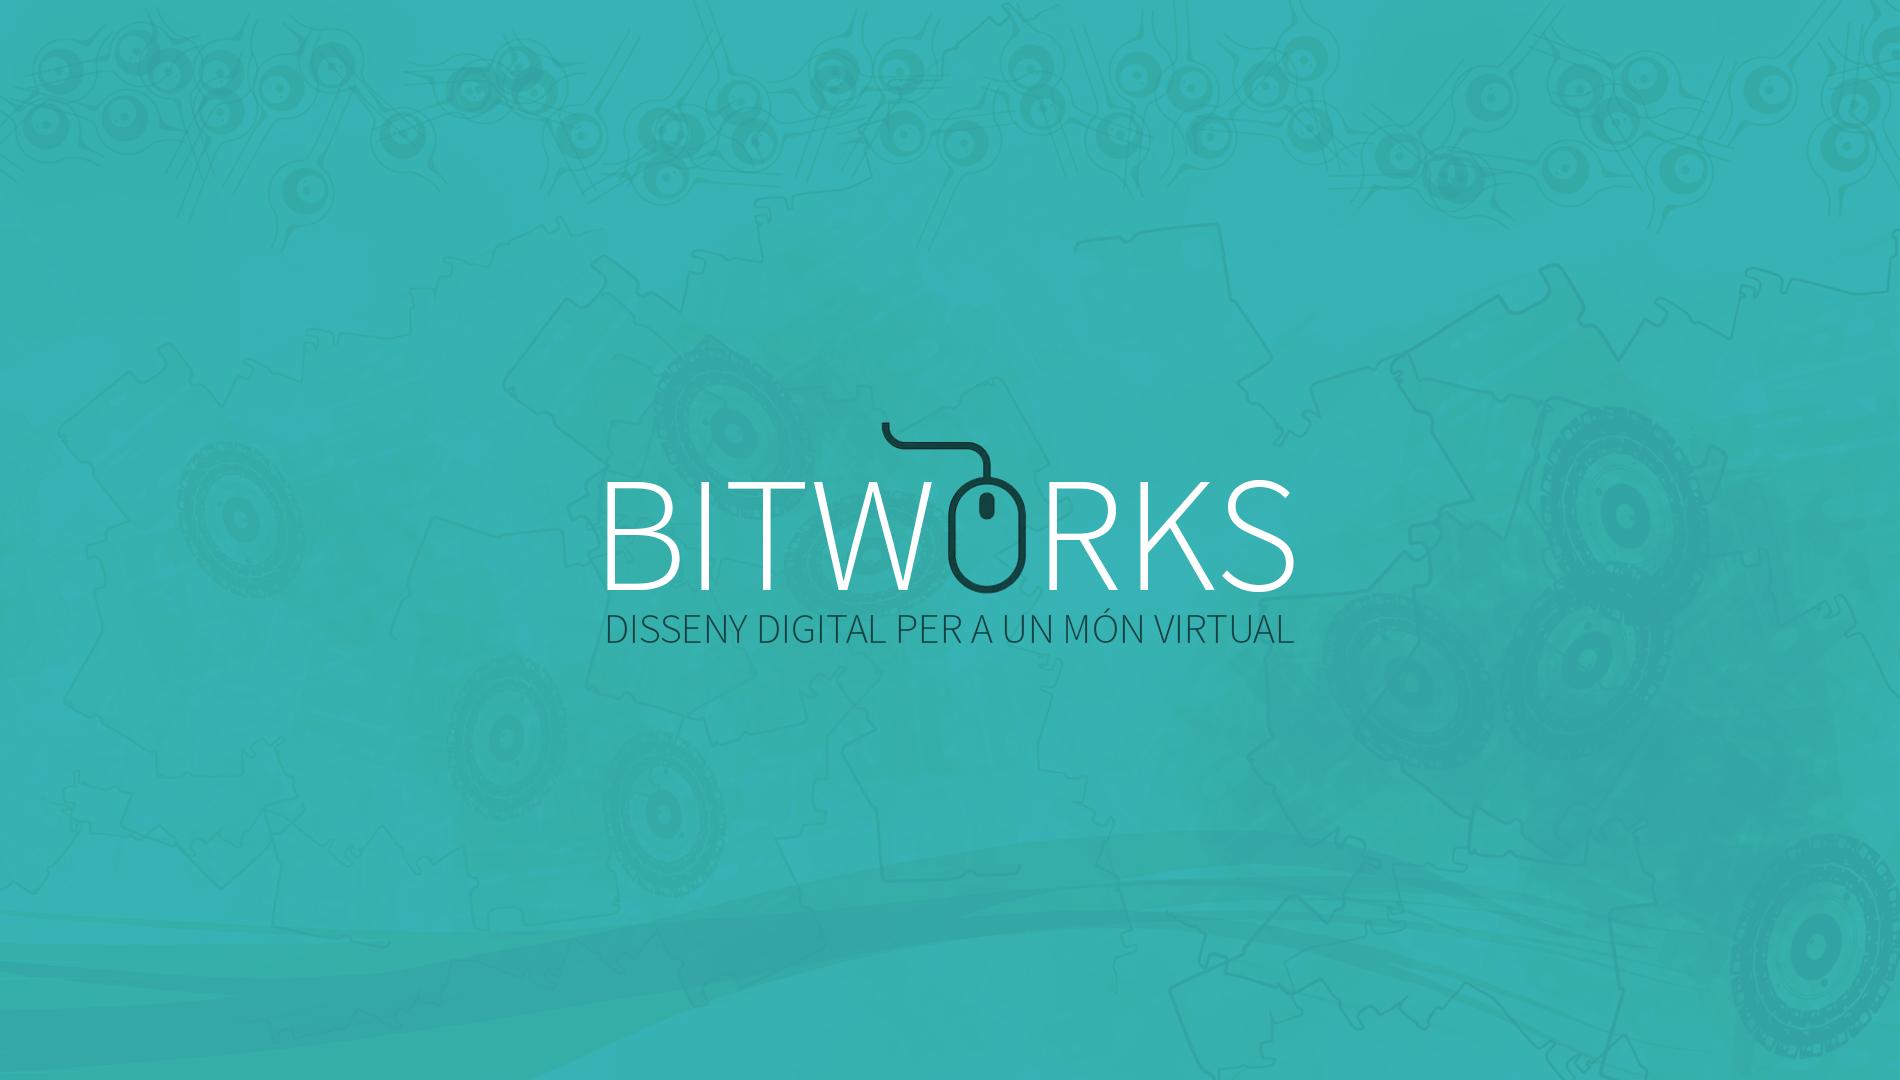 BITWORKS 01